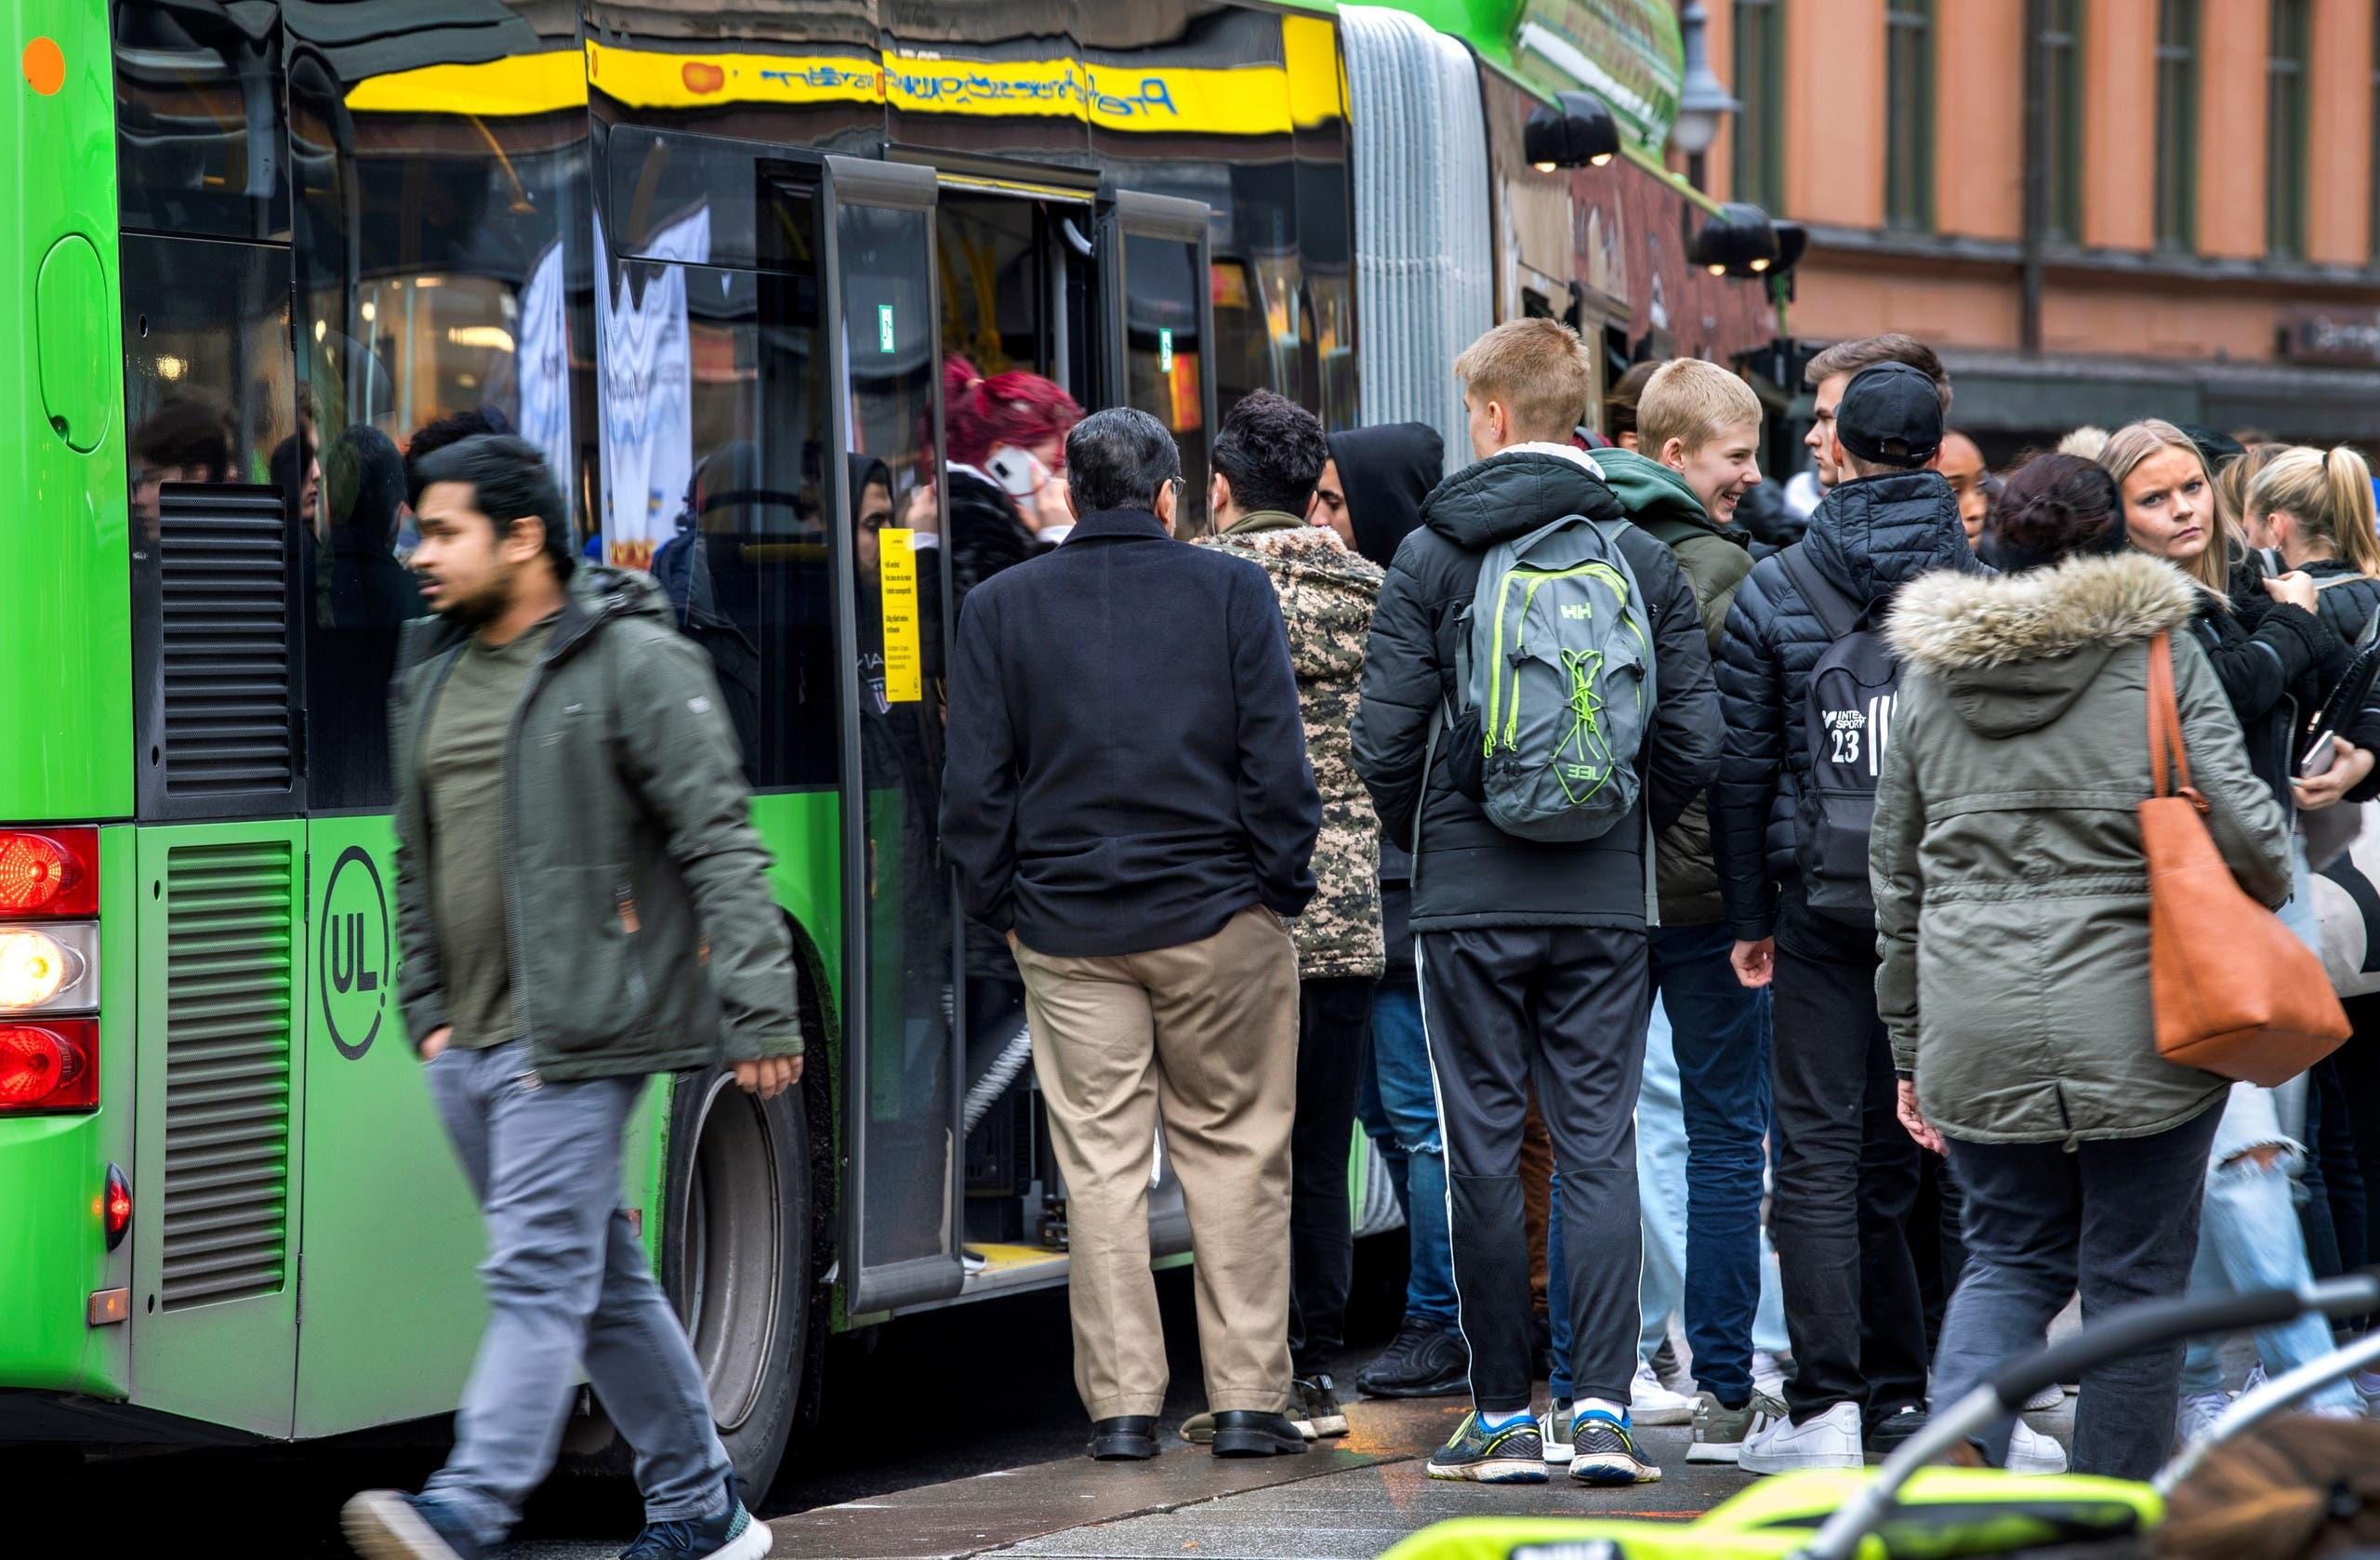 People board a bus as the coronavirus disease (COVID-19) outbreak continues in Uppsala, Sweden October 21, 2020. (TT News Agency/Claudio Bresciani via Reuters)